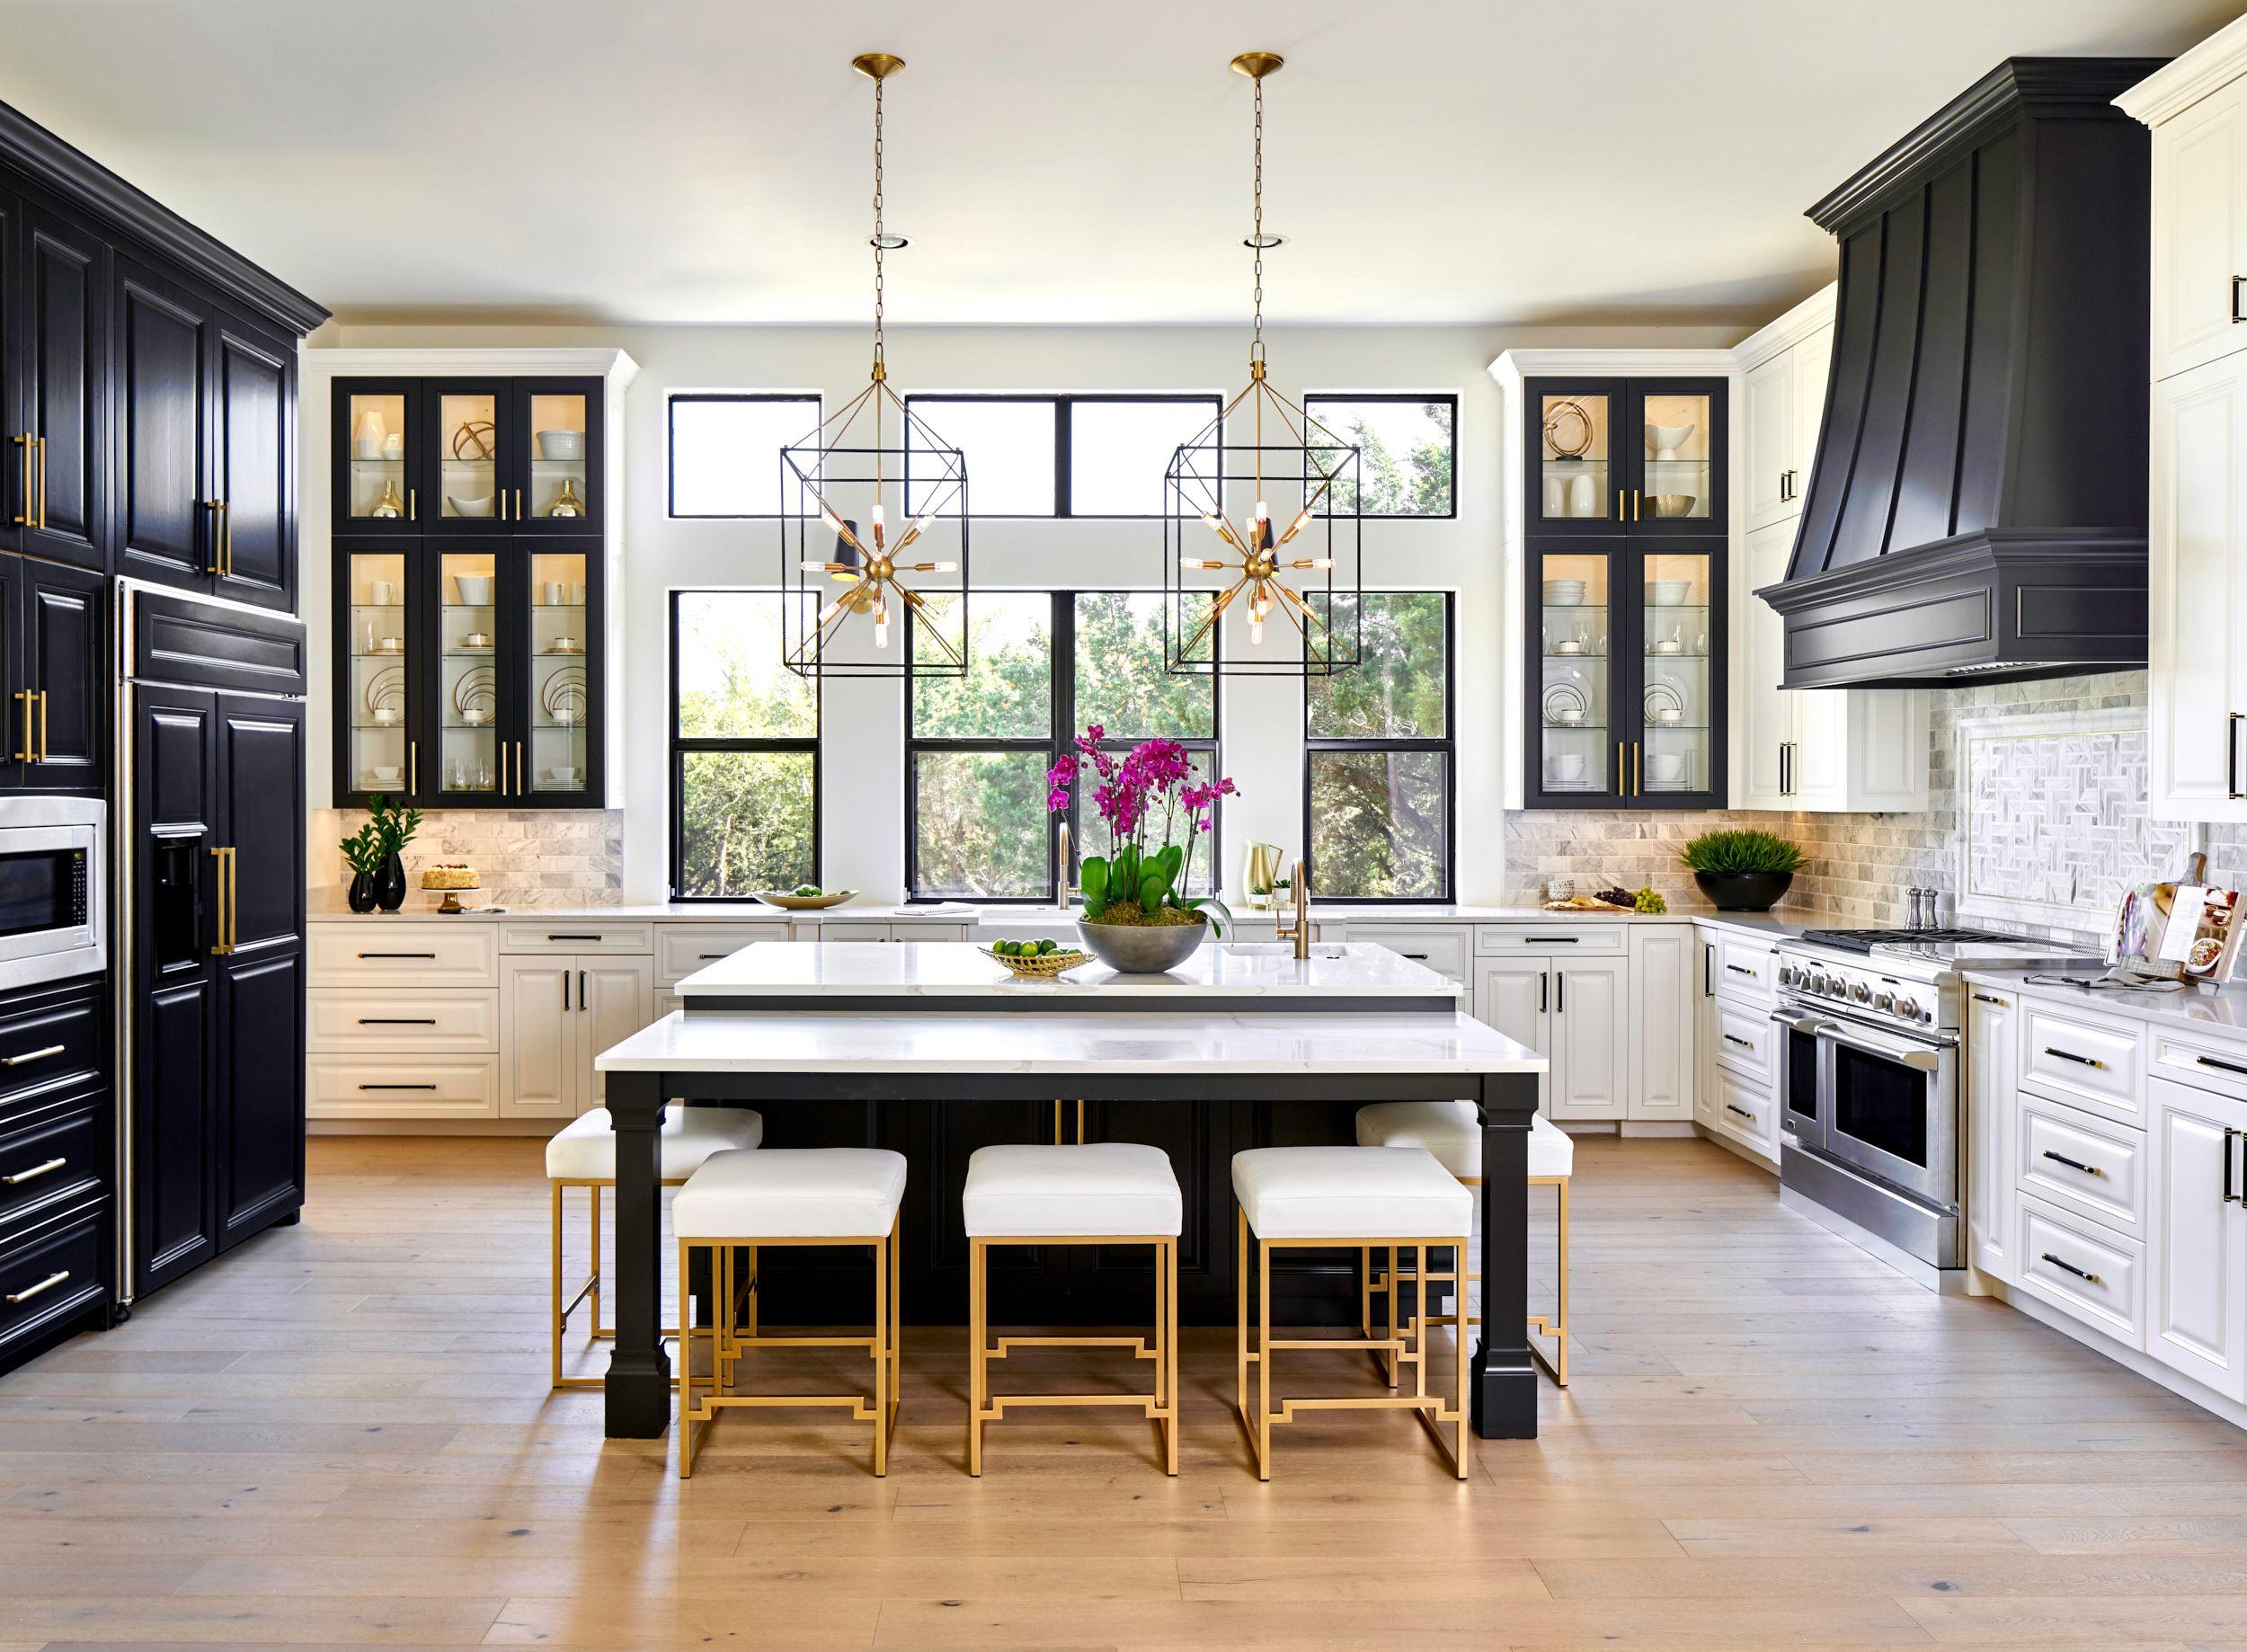 Black, White & Gold Transitional Kitchen with European